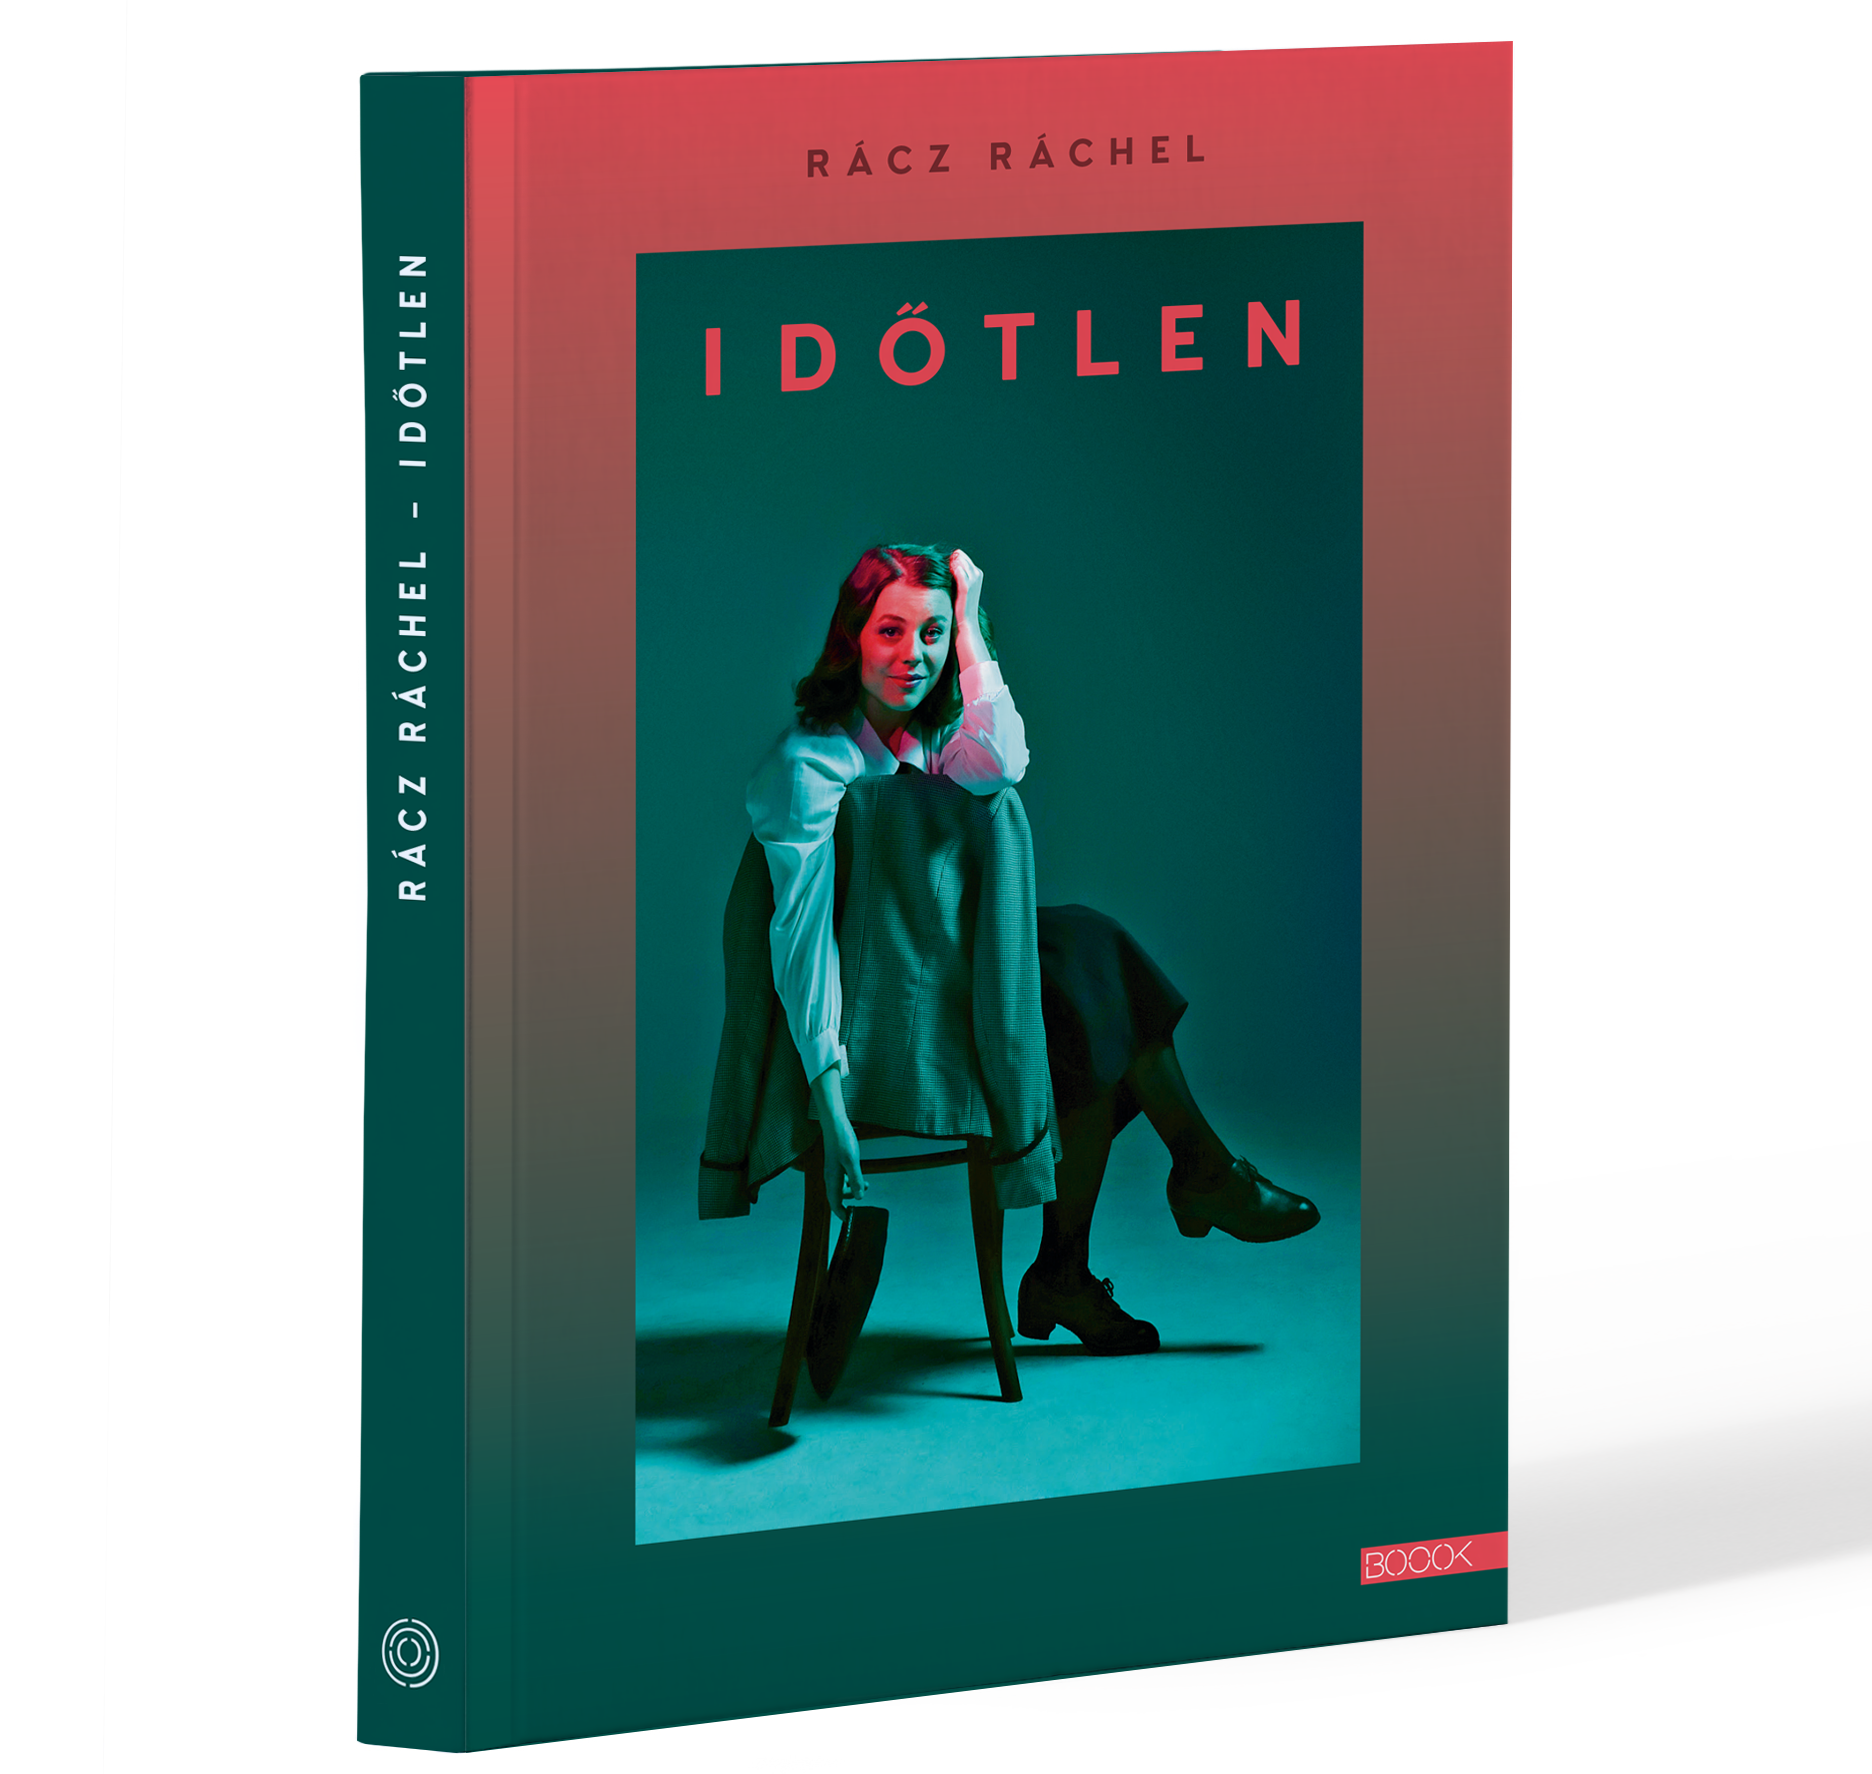 webshop_idotlen.png